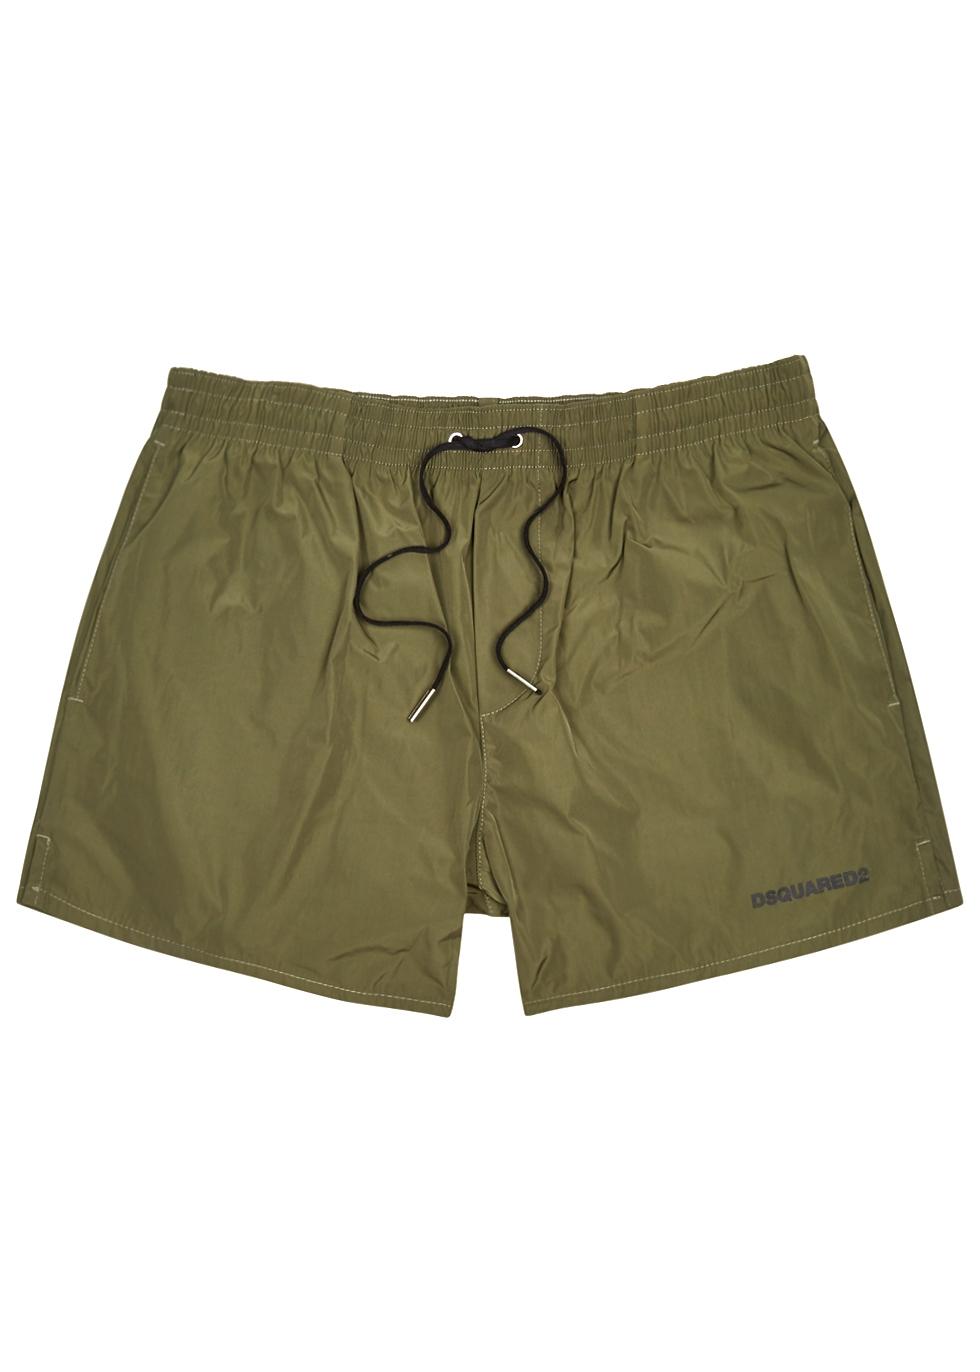 Icon army green swim shorts - DSQUARED2